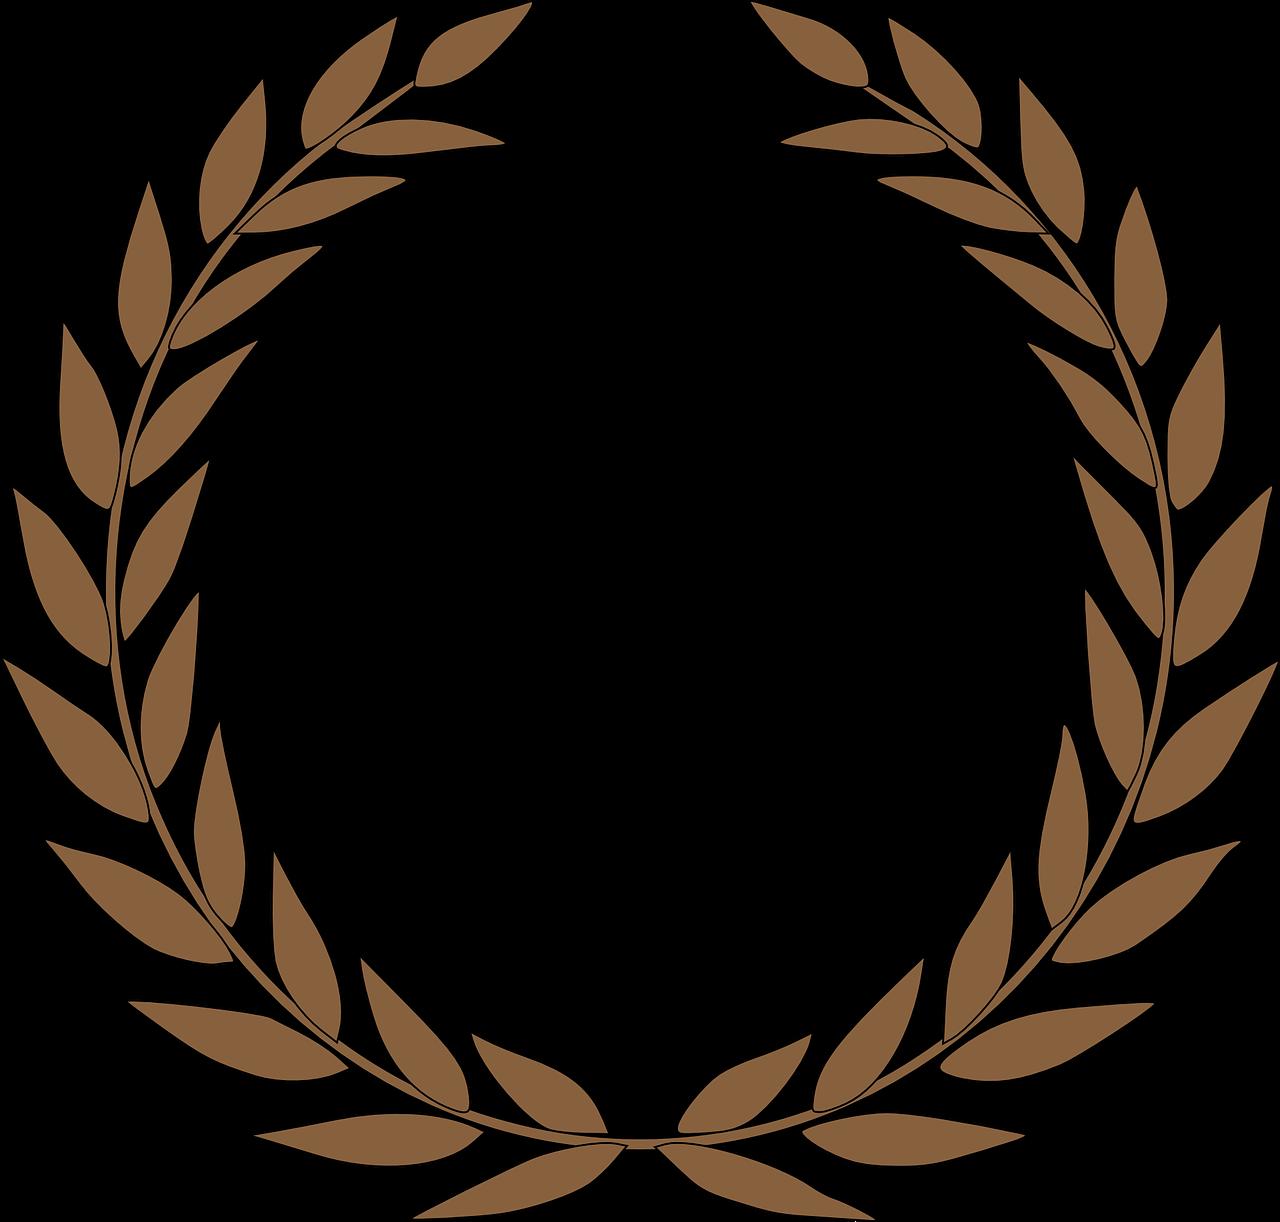 Free Image On Pixabay Laurel Wreath Accolade Winner Laurel Wreath Laurel Vector Gold Laurel Wreath